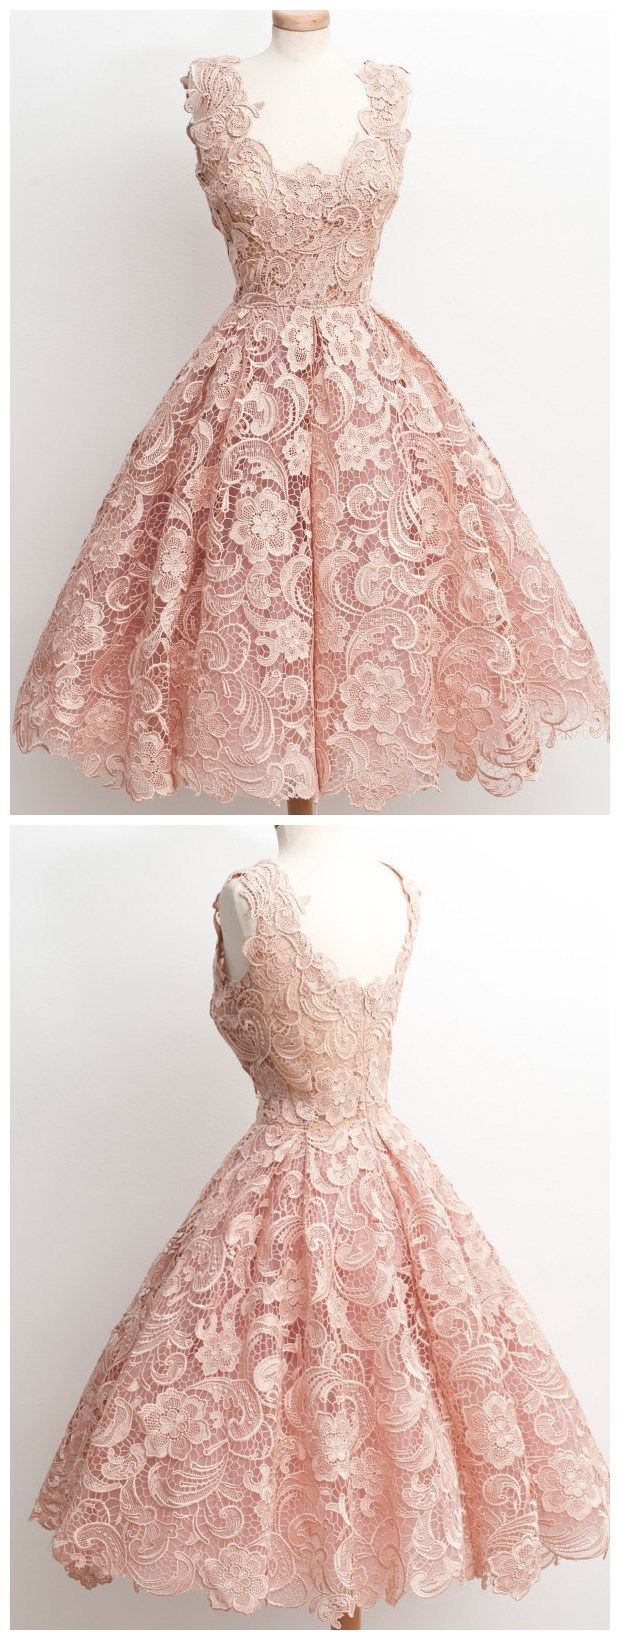 Mejores 351 imágenes de Dresses en Pinterest | Vestidos de noche ...